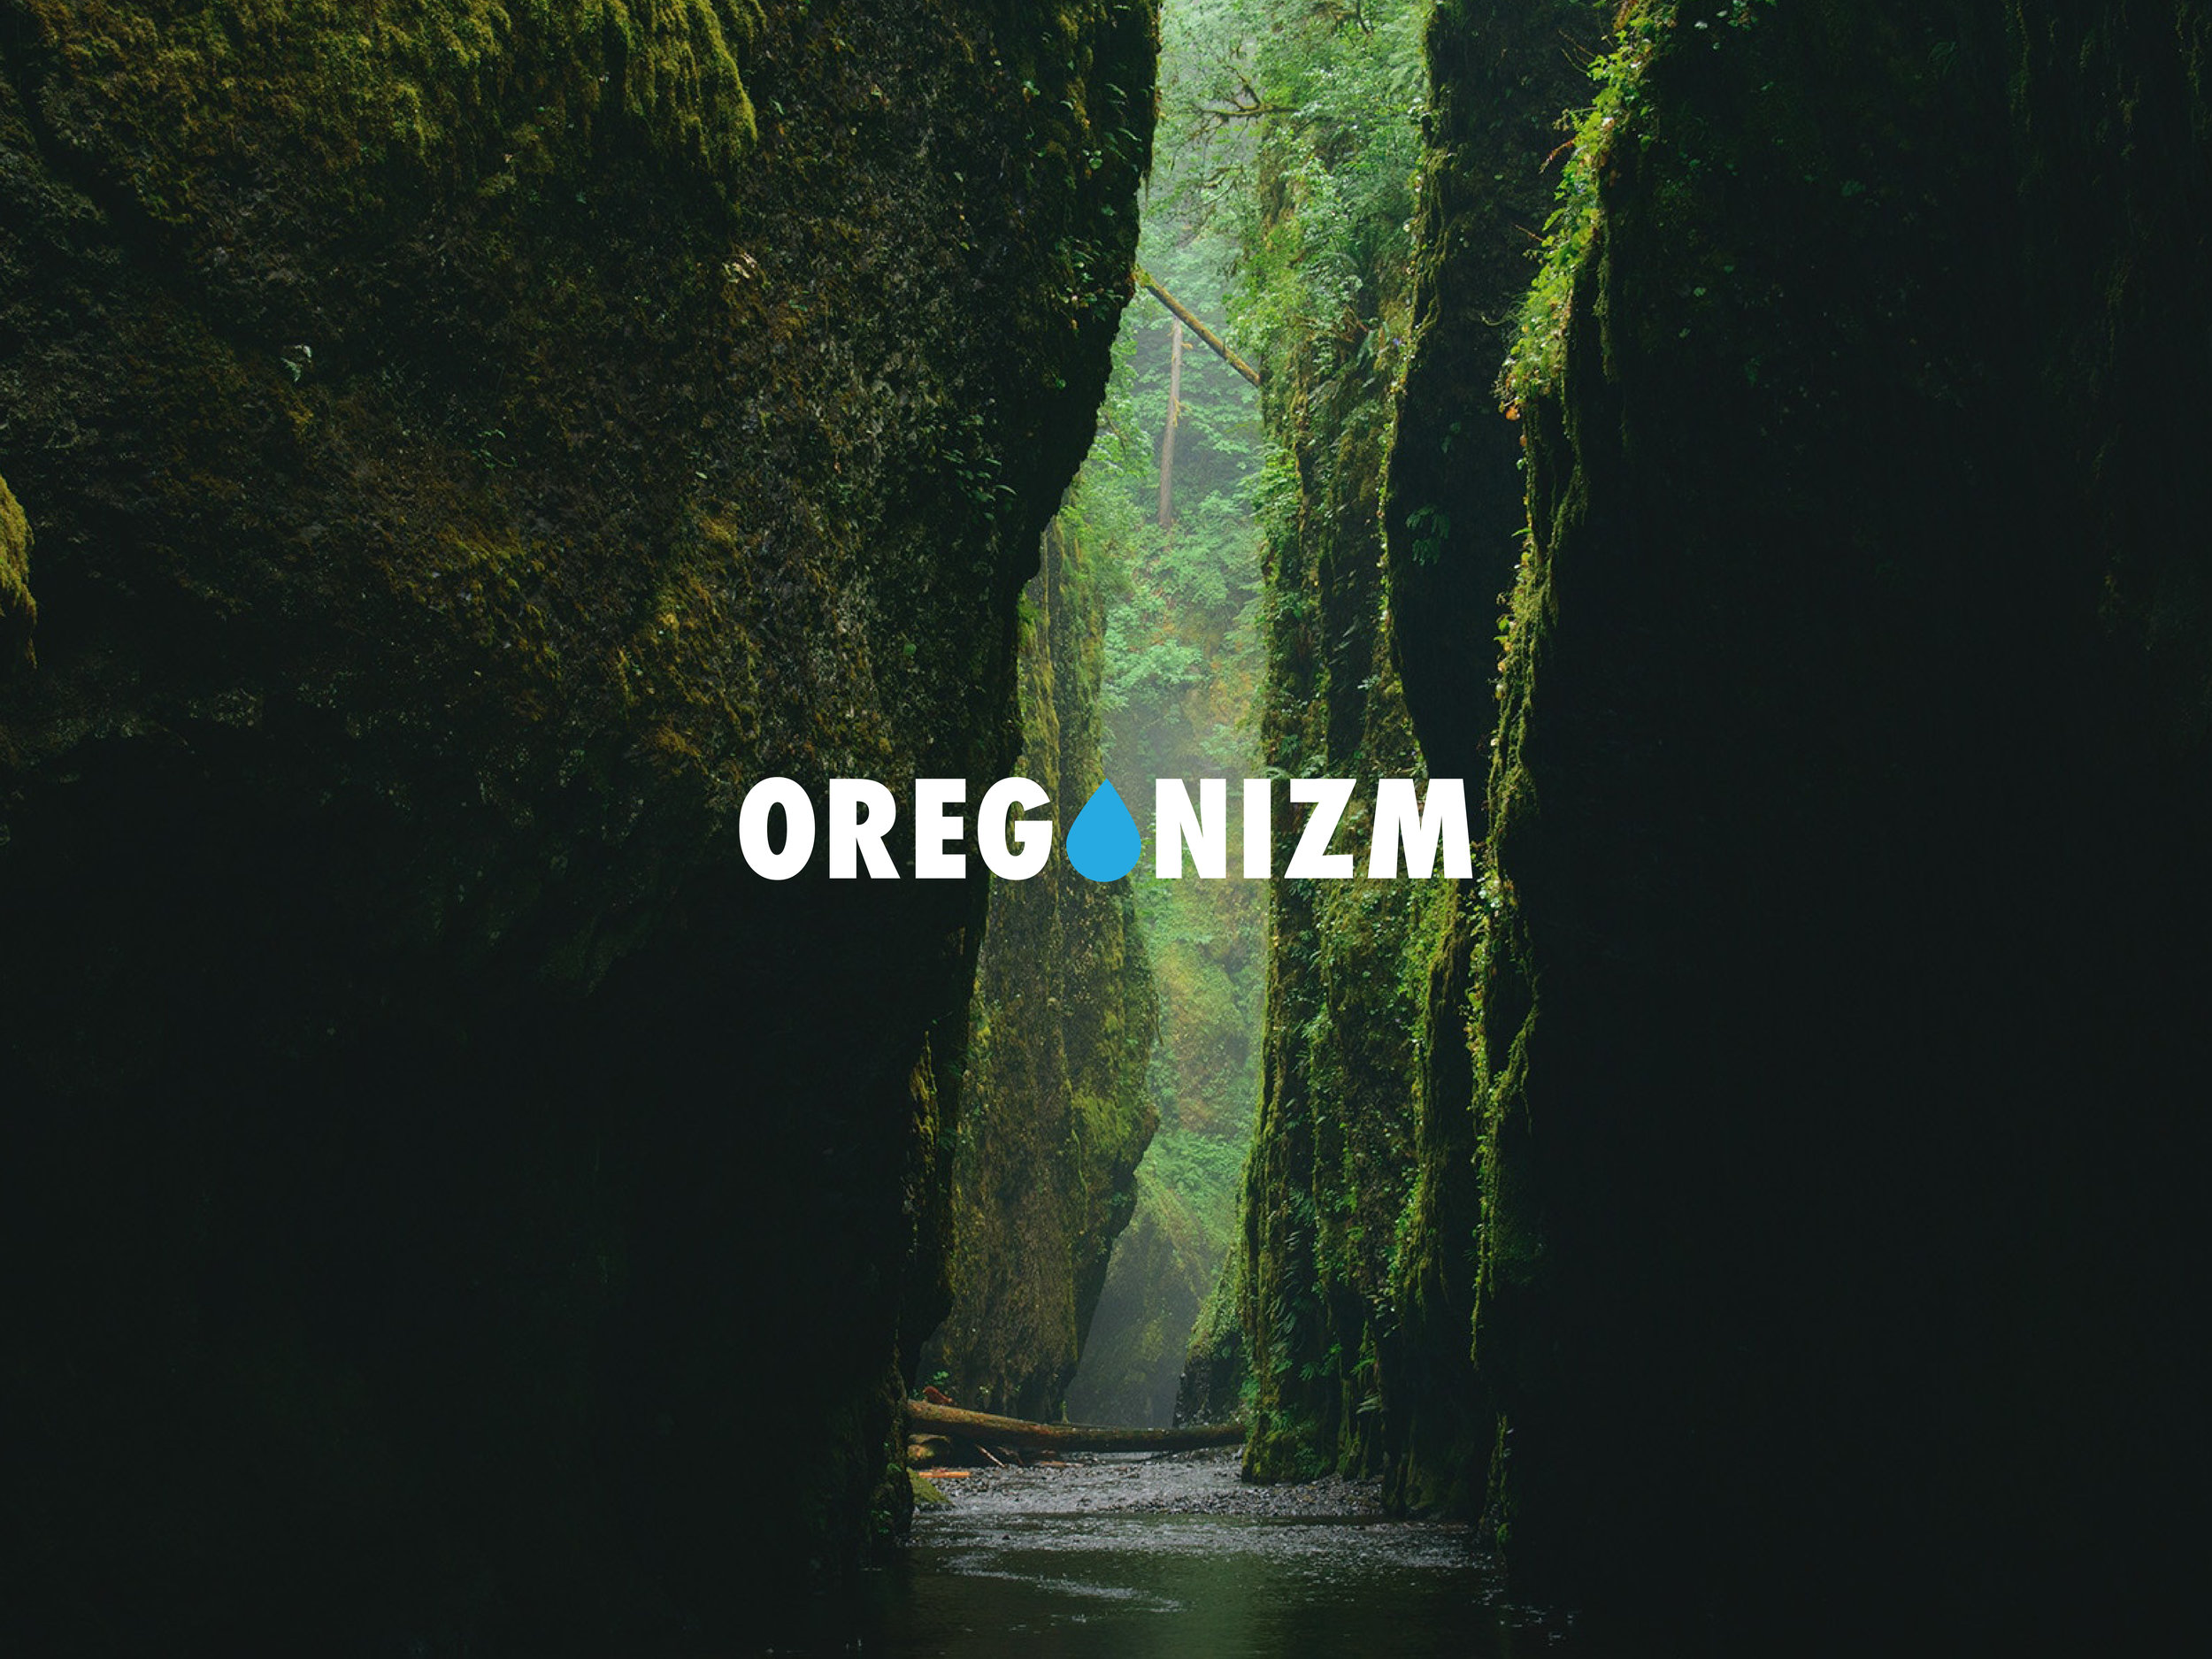 Oregonizm title.jpg